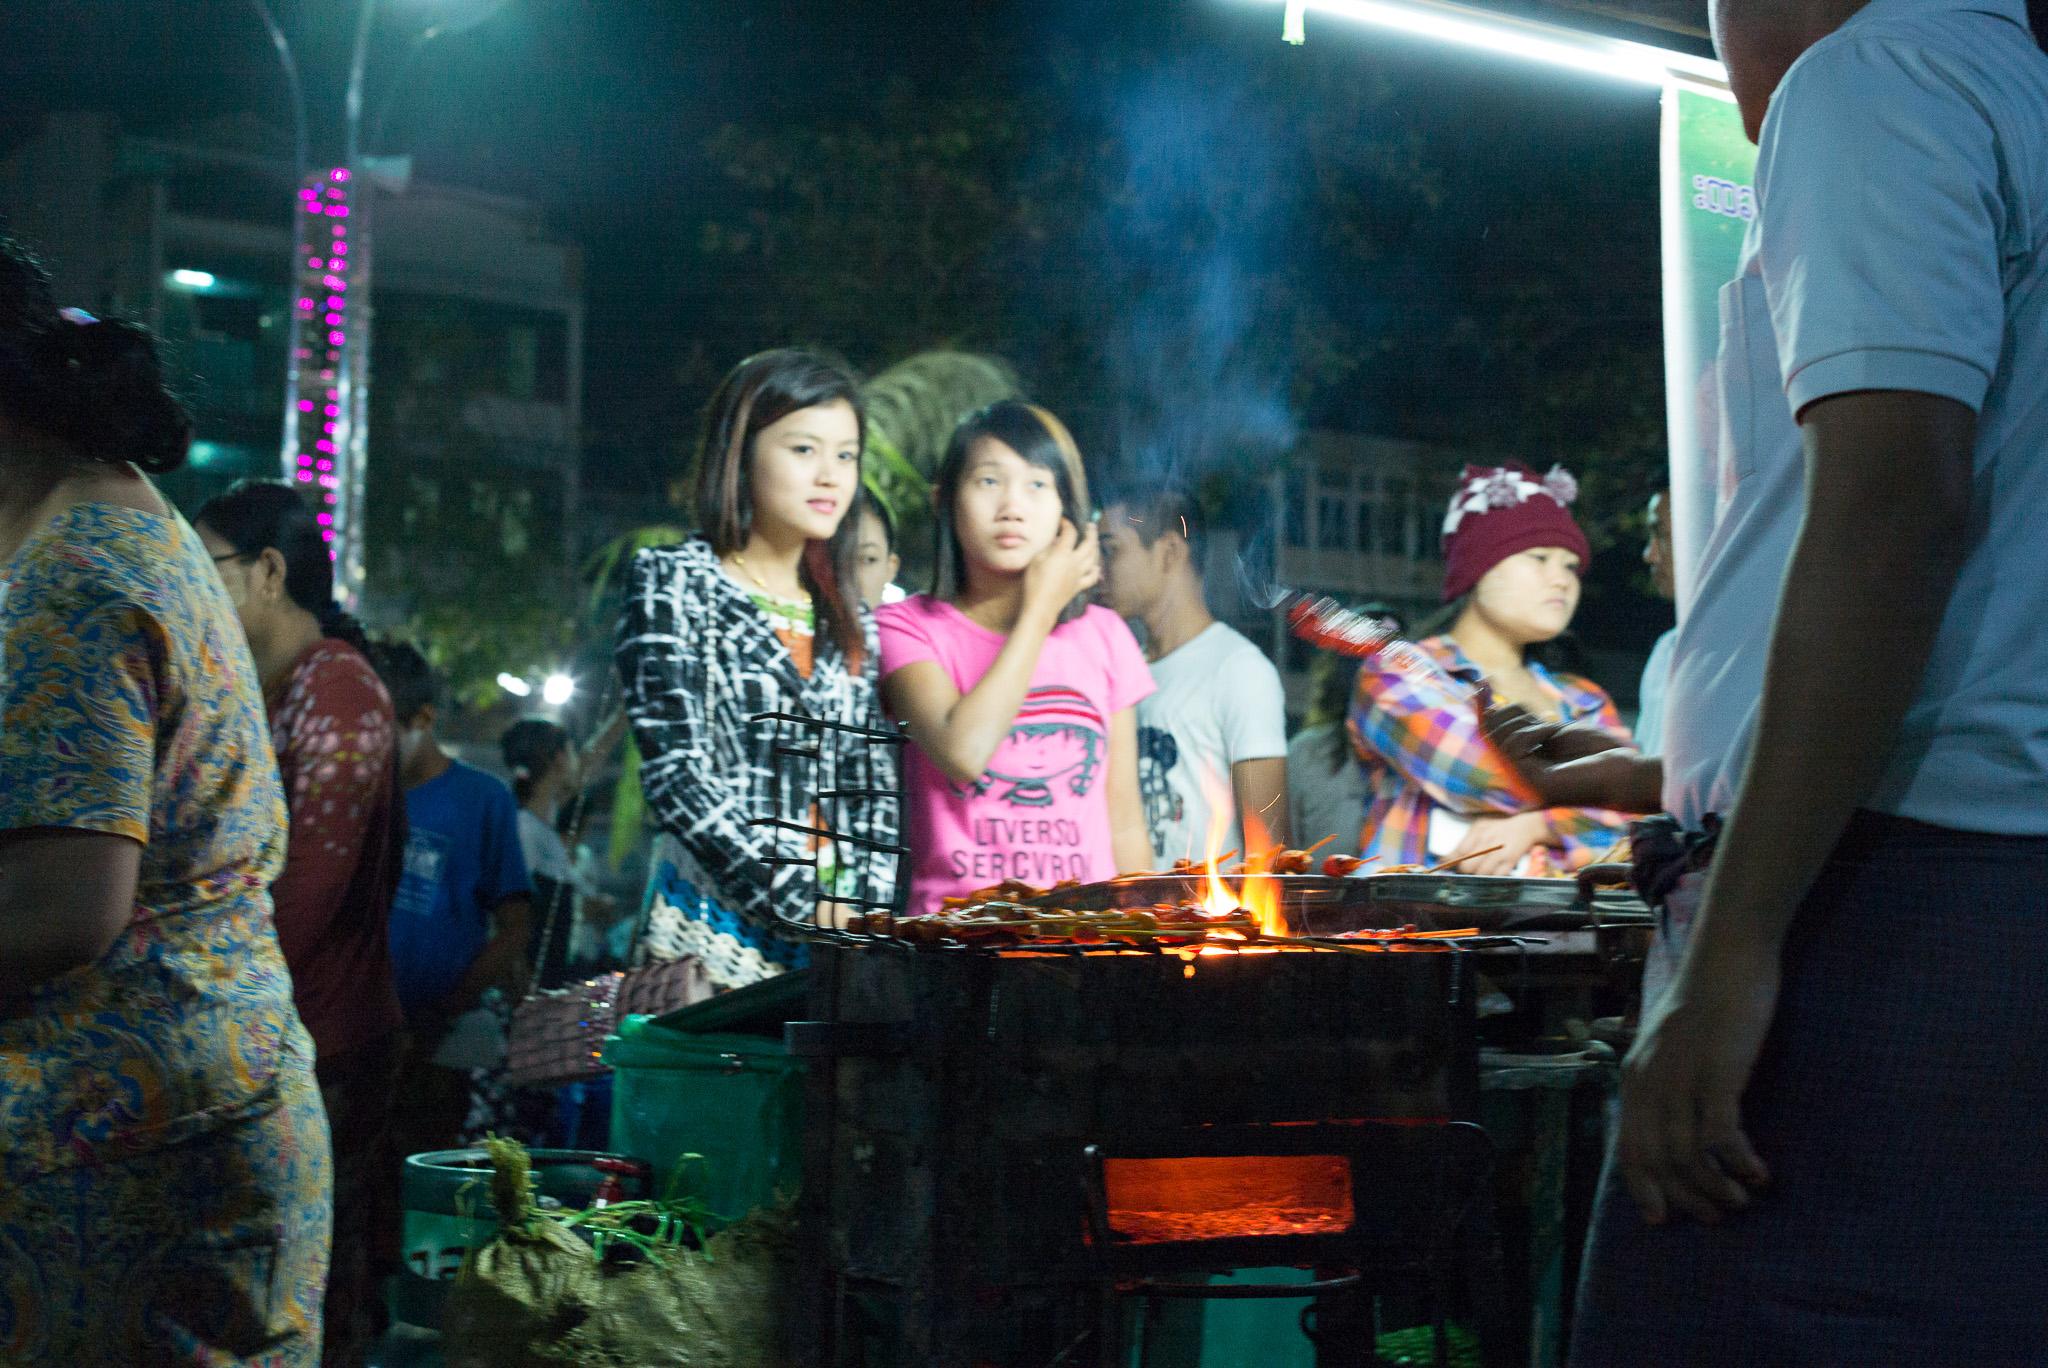 22-Burma-1535-P-1412.jpg